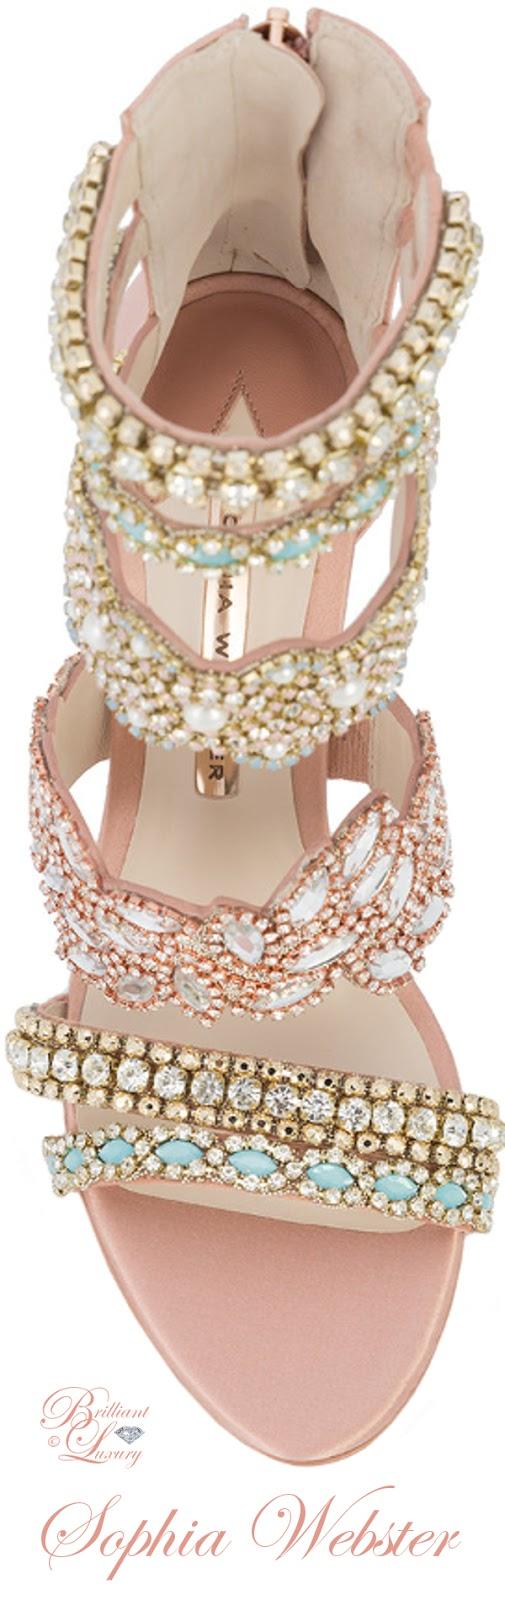 Brilliant Luxury ♦ Sophia Webster beaded strap sandals